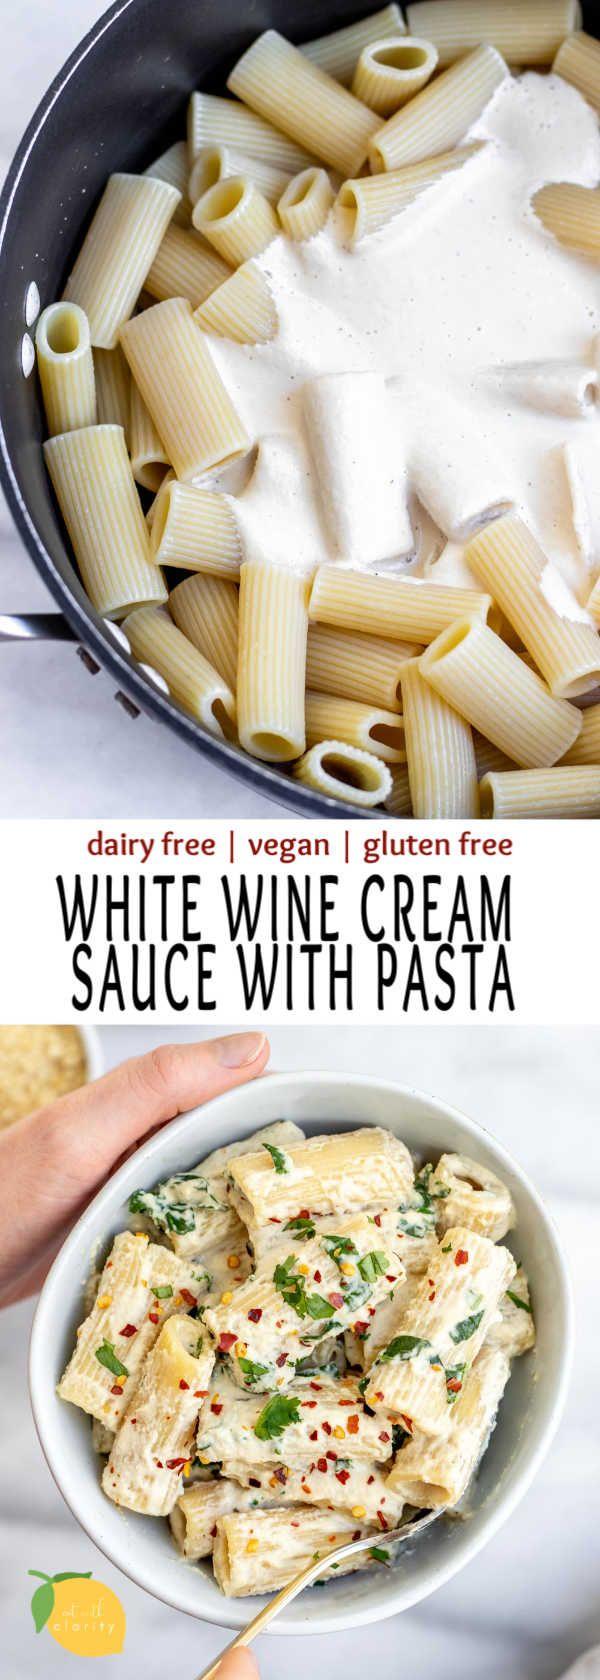 Vegan White Wine Cream Sauce With Rigatoni Eat With Clarity Recipe In 2020 Dairy Free Pasta White Sauce Recipes Dairy Free Pasta Recipes